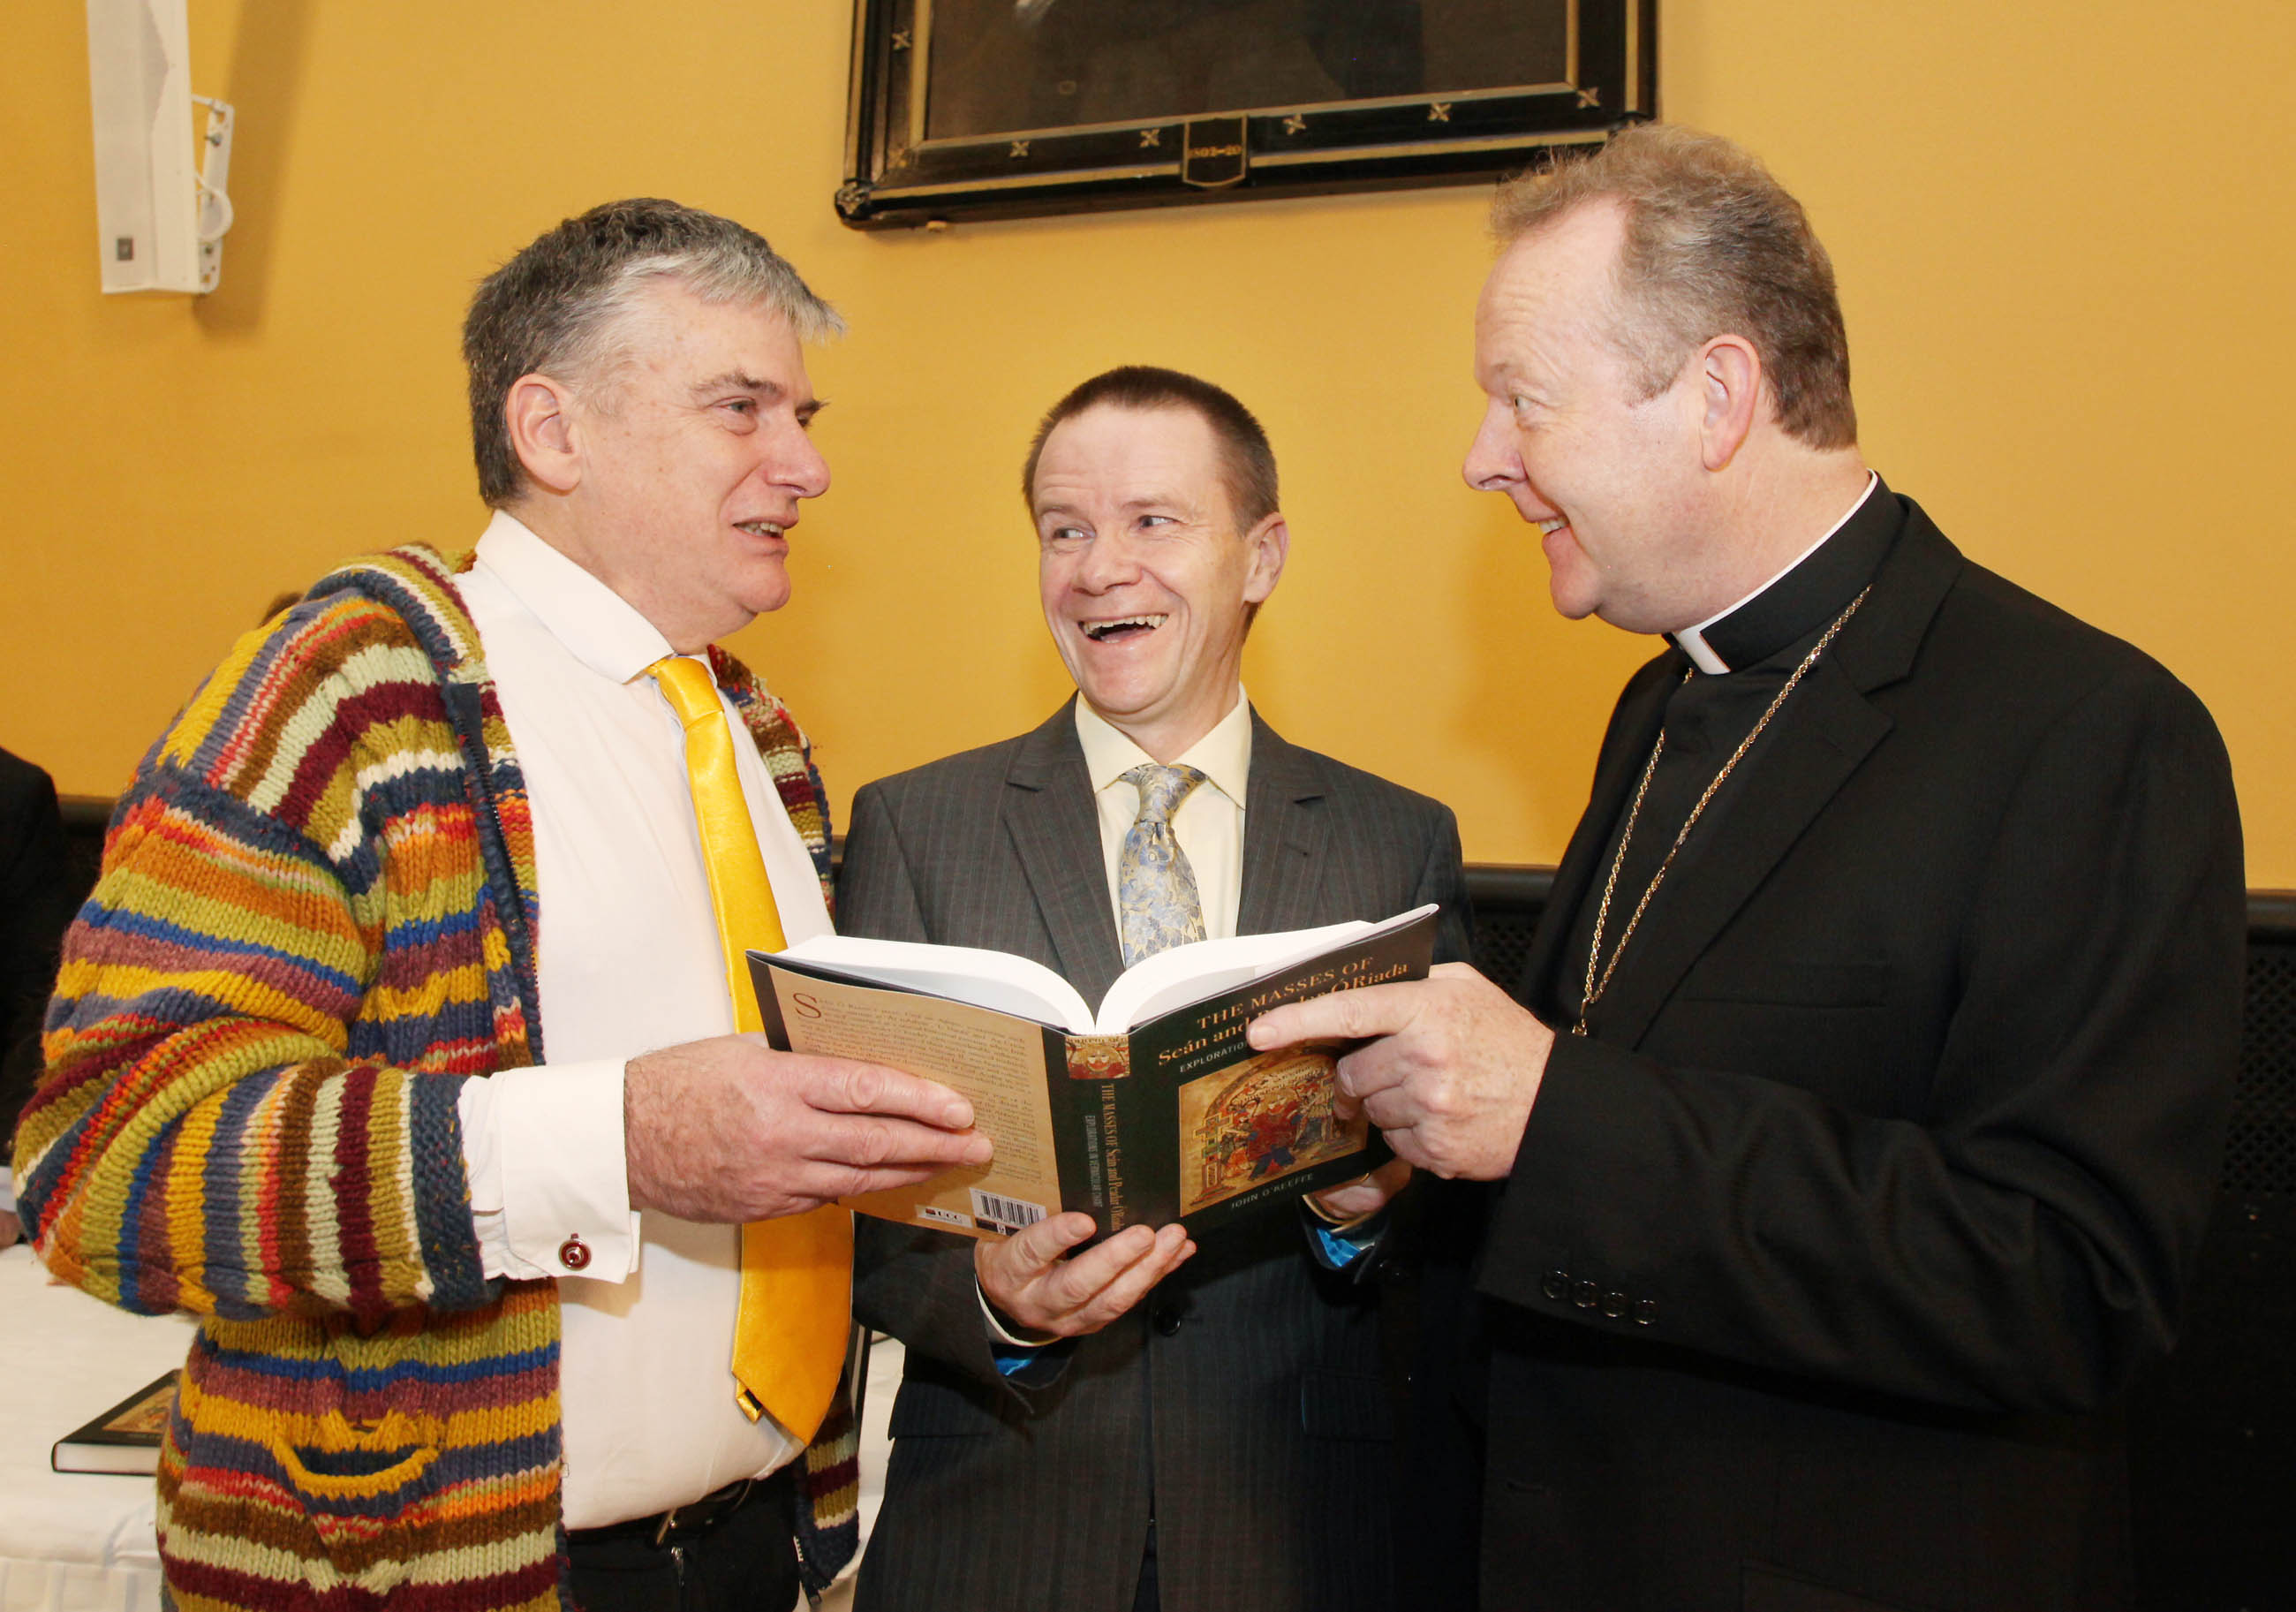 Launch of The Masses of Seán and Peadar Ó Riada